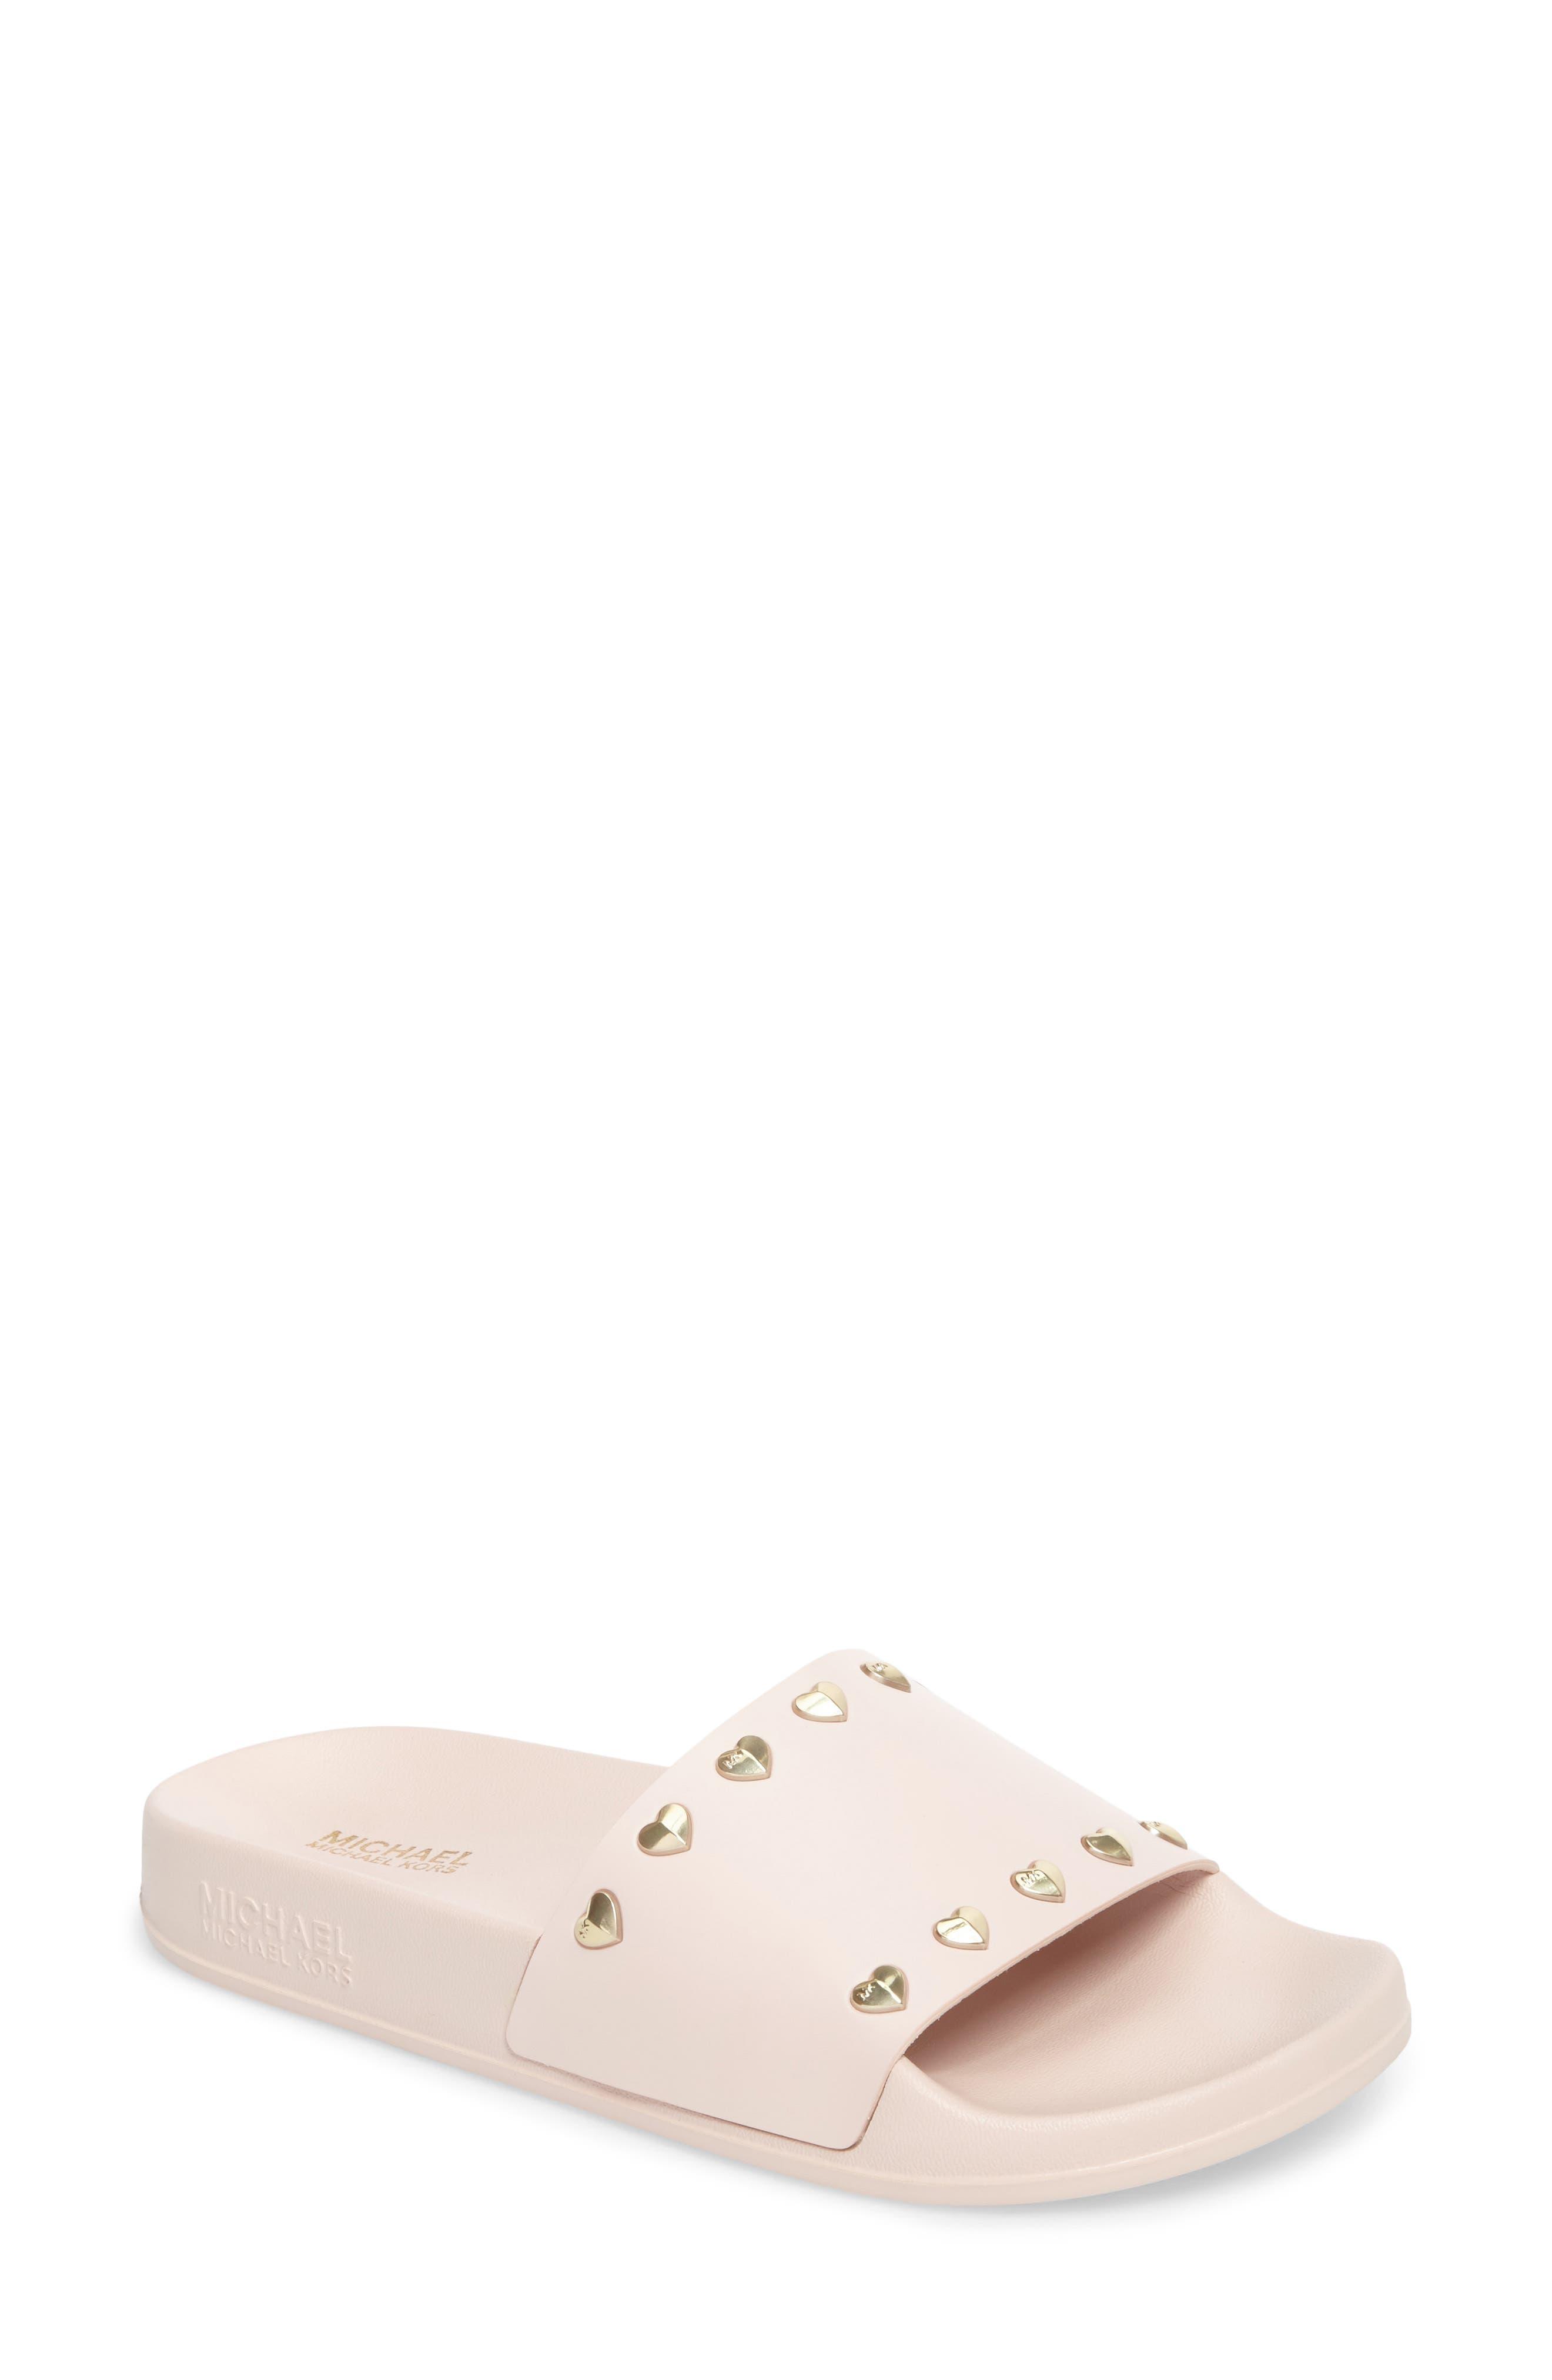 Zooey Slide Sandal,                             Main thumbnail 1, color,                             Soft Pink